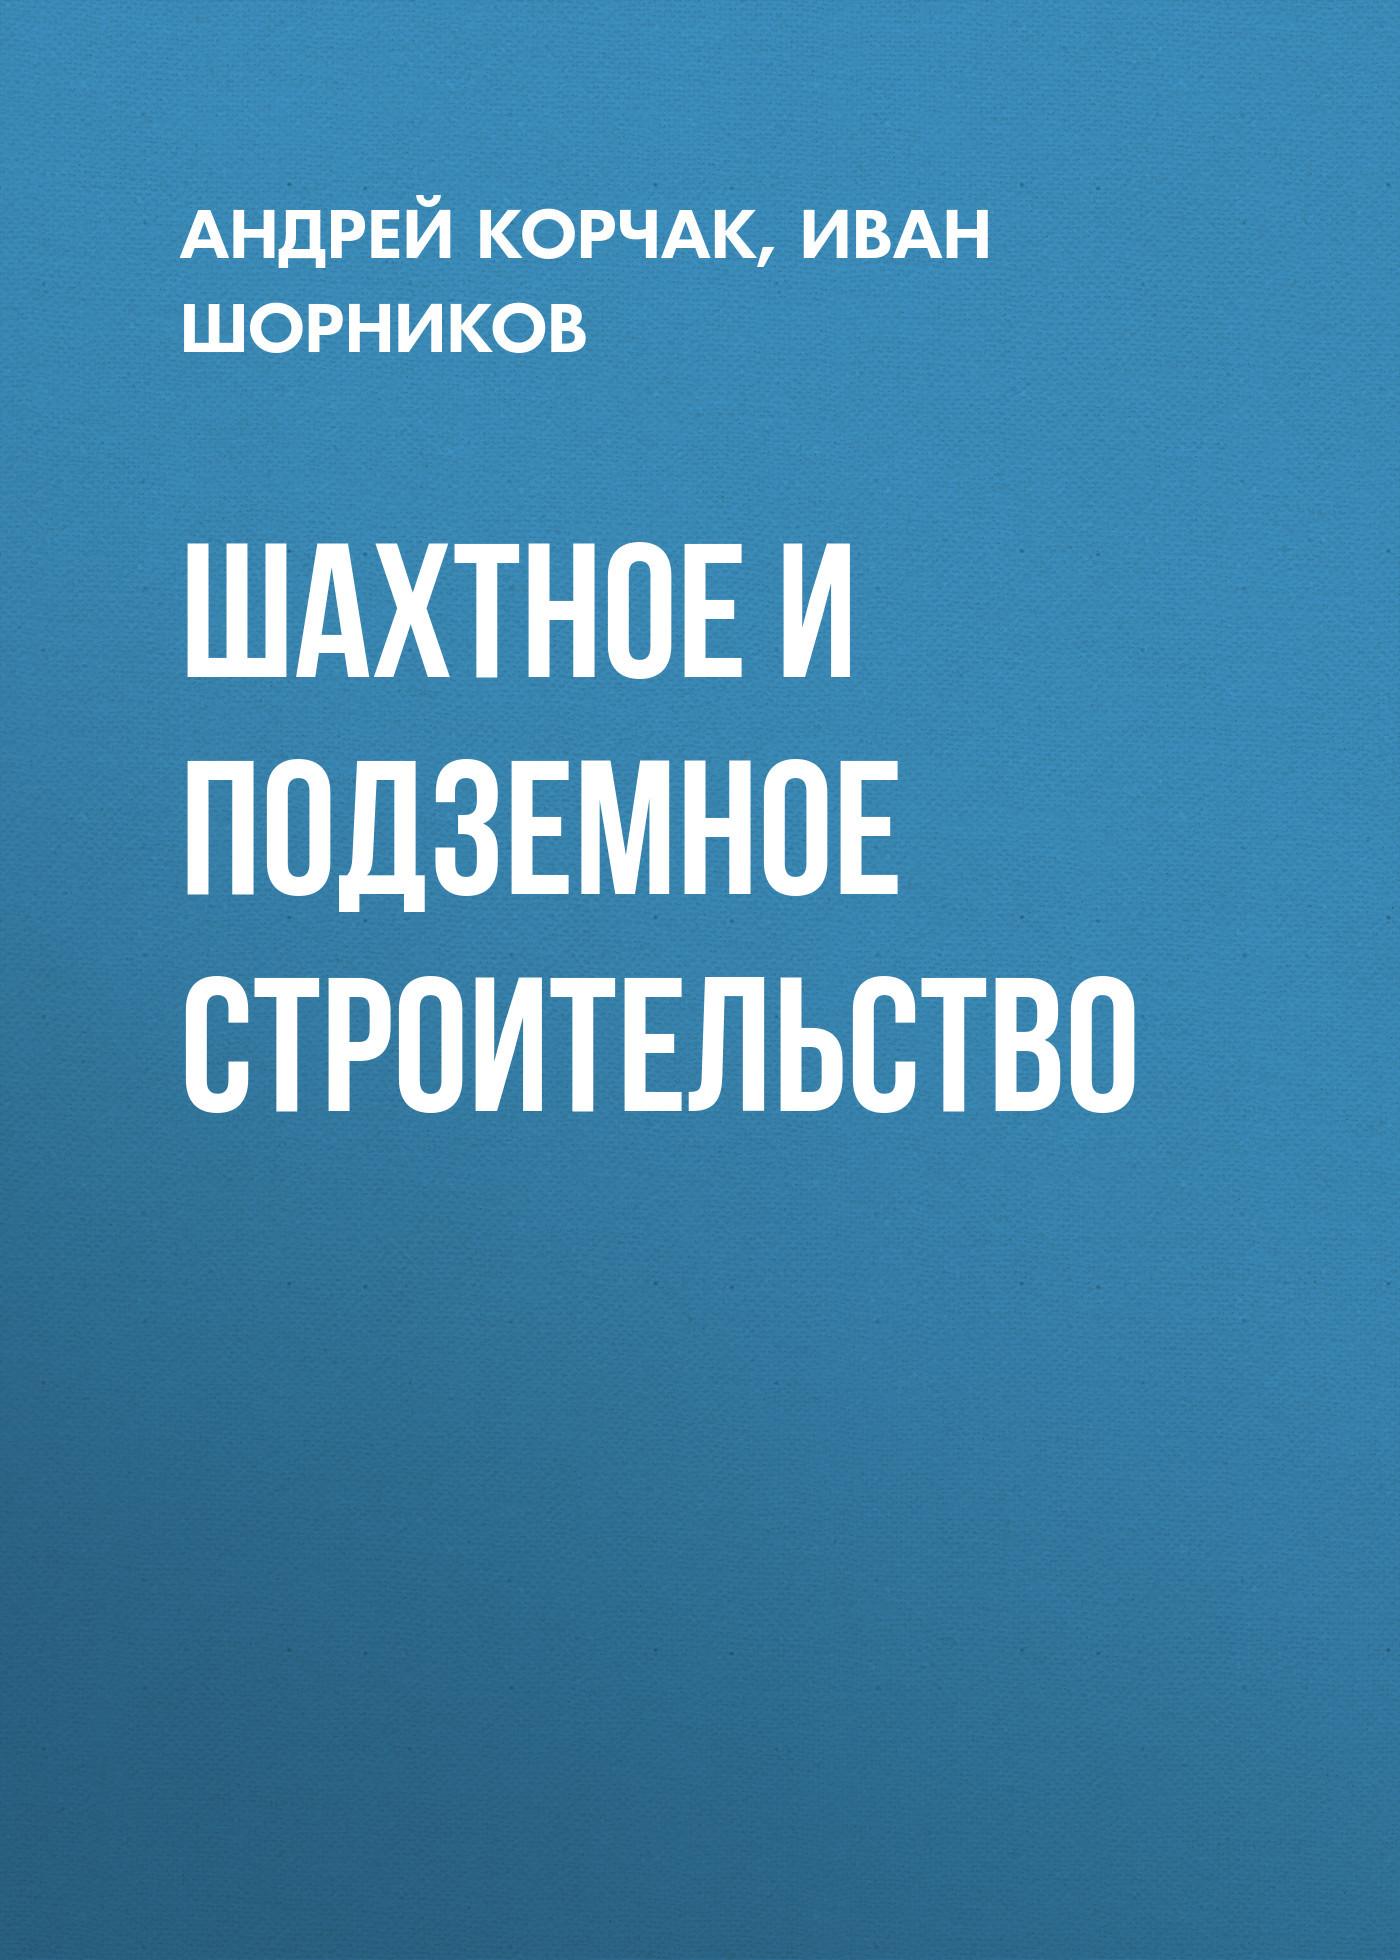 Андрей Корчак бесплатно